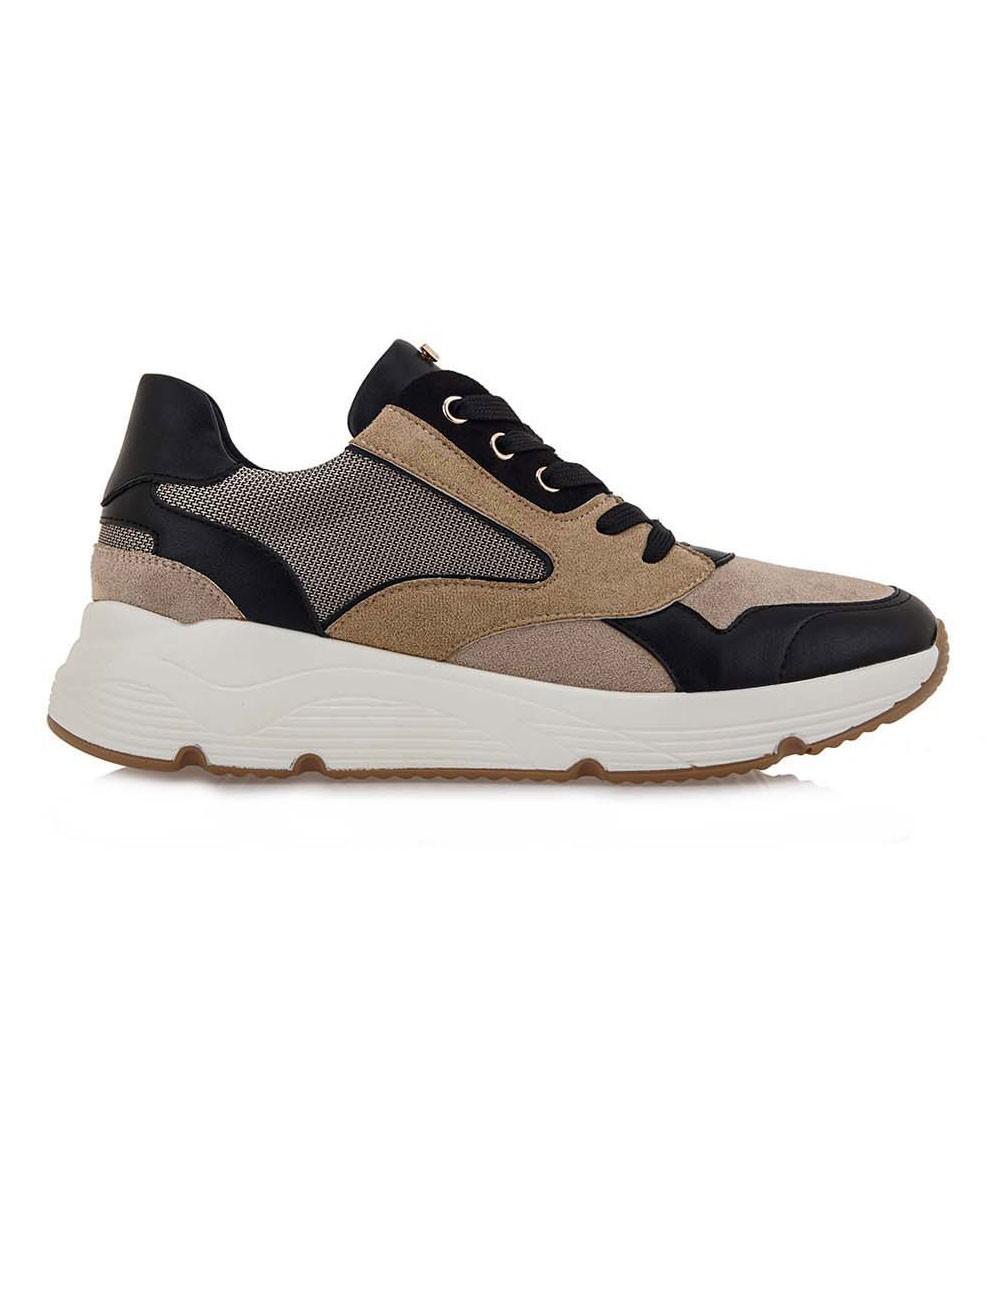 Renato Garini Γυναικεία Παπούτσια Sneakers 117-19R Μπέζ Καστόρι Μαύρο N119R117219M